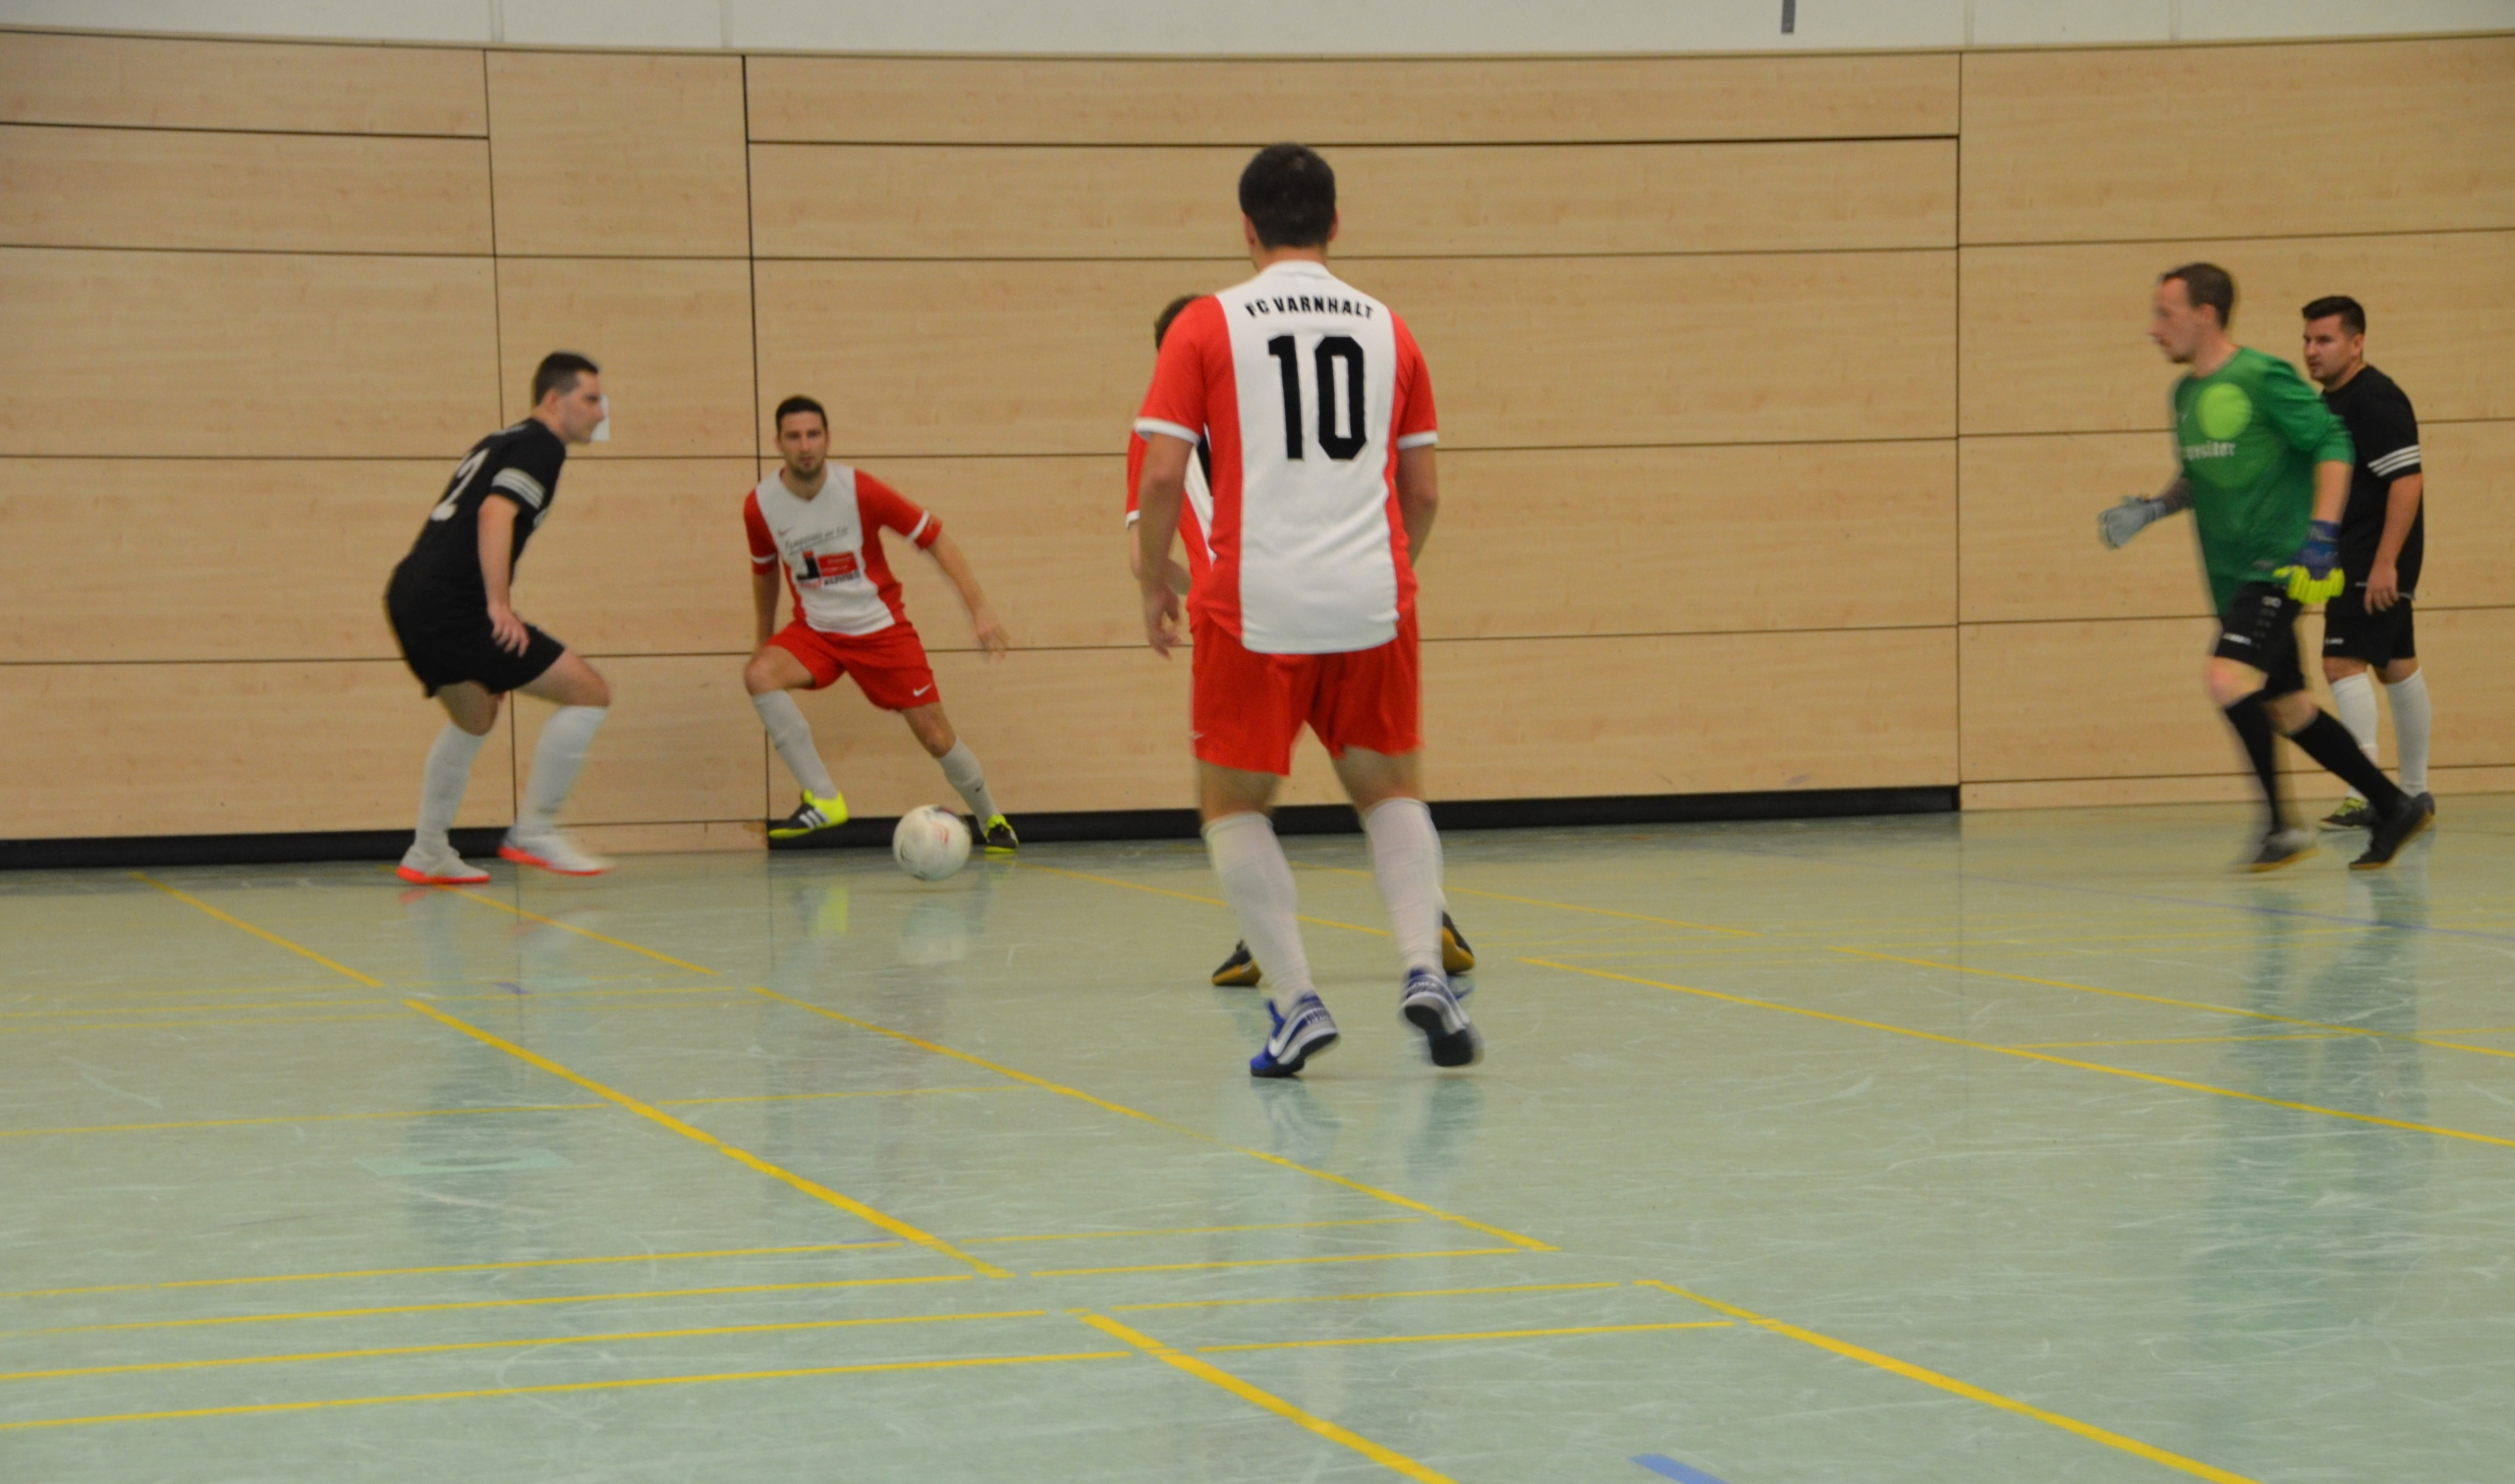 FC Varnhalt - Tipico Cup 2020